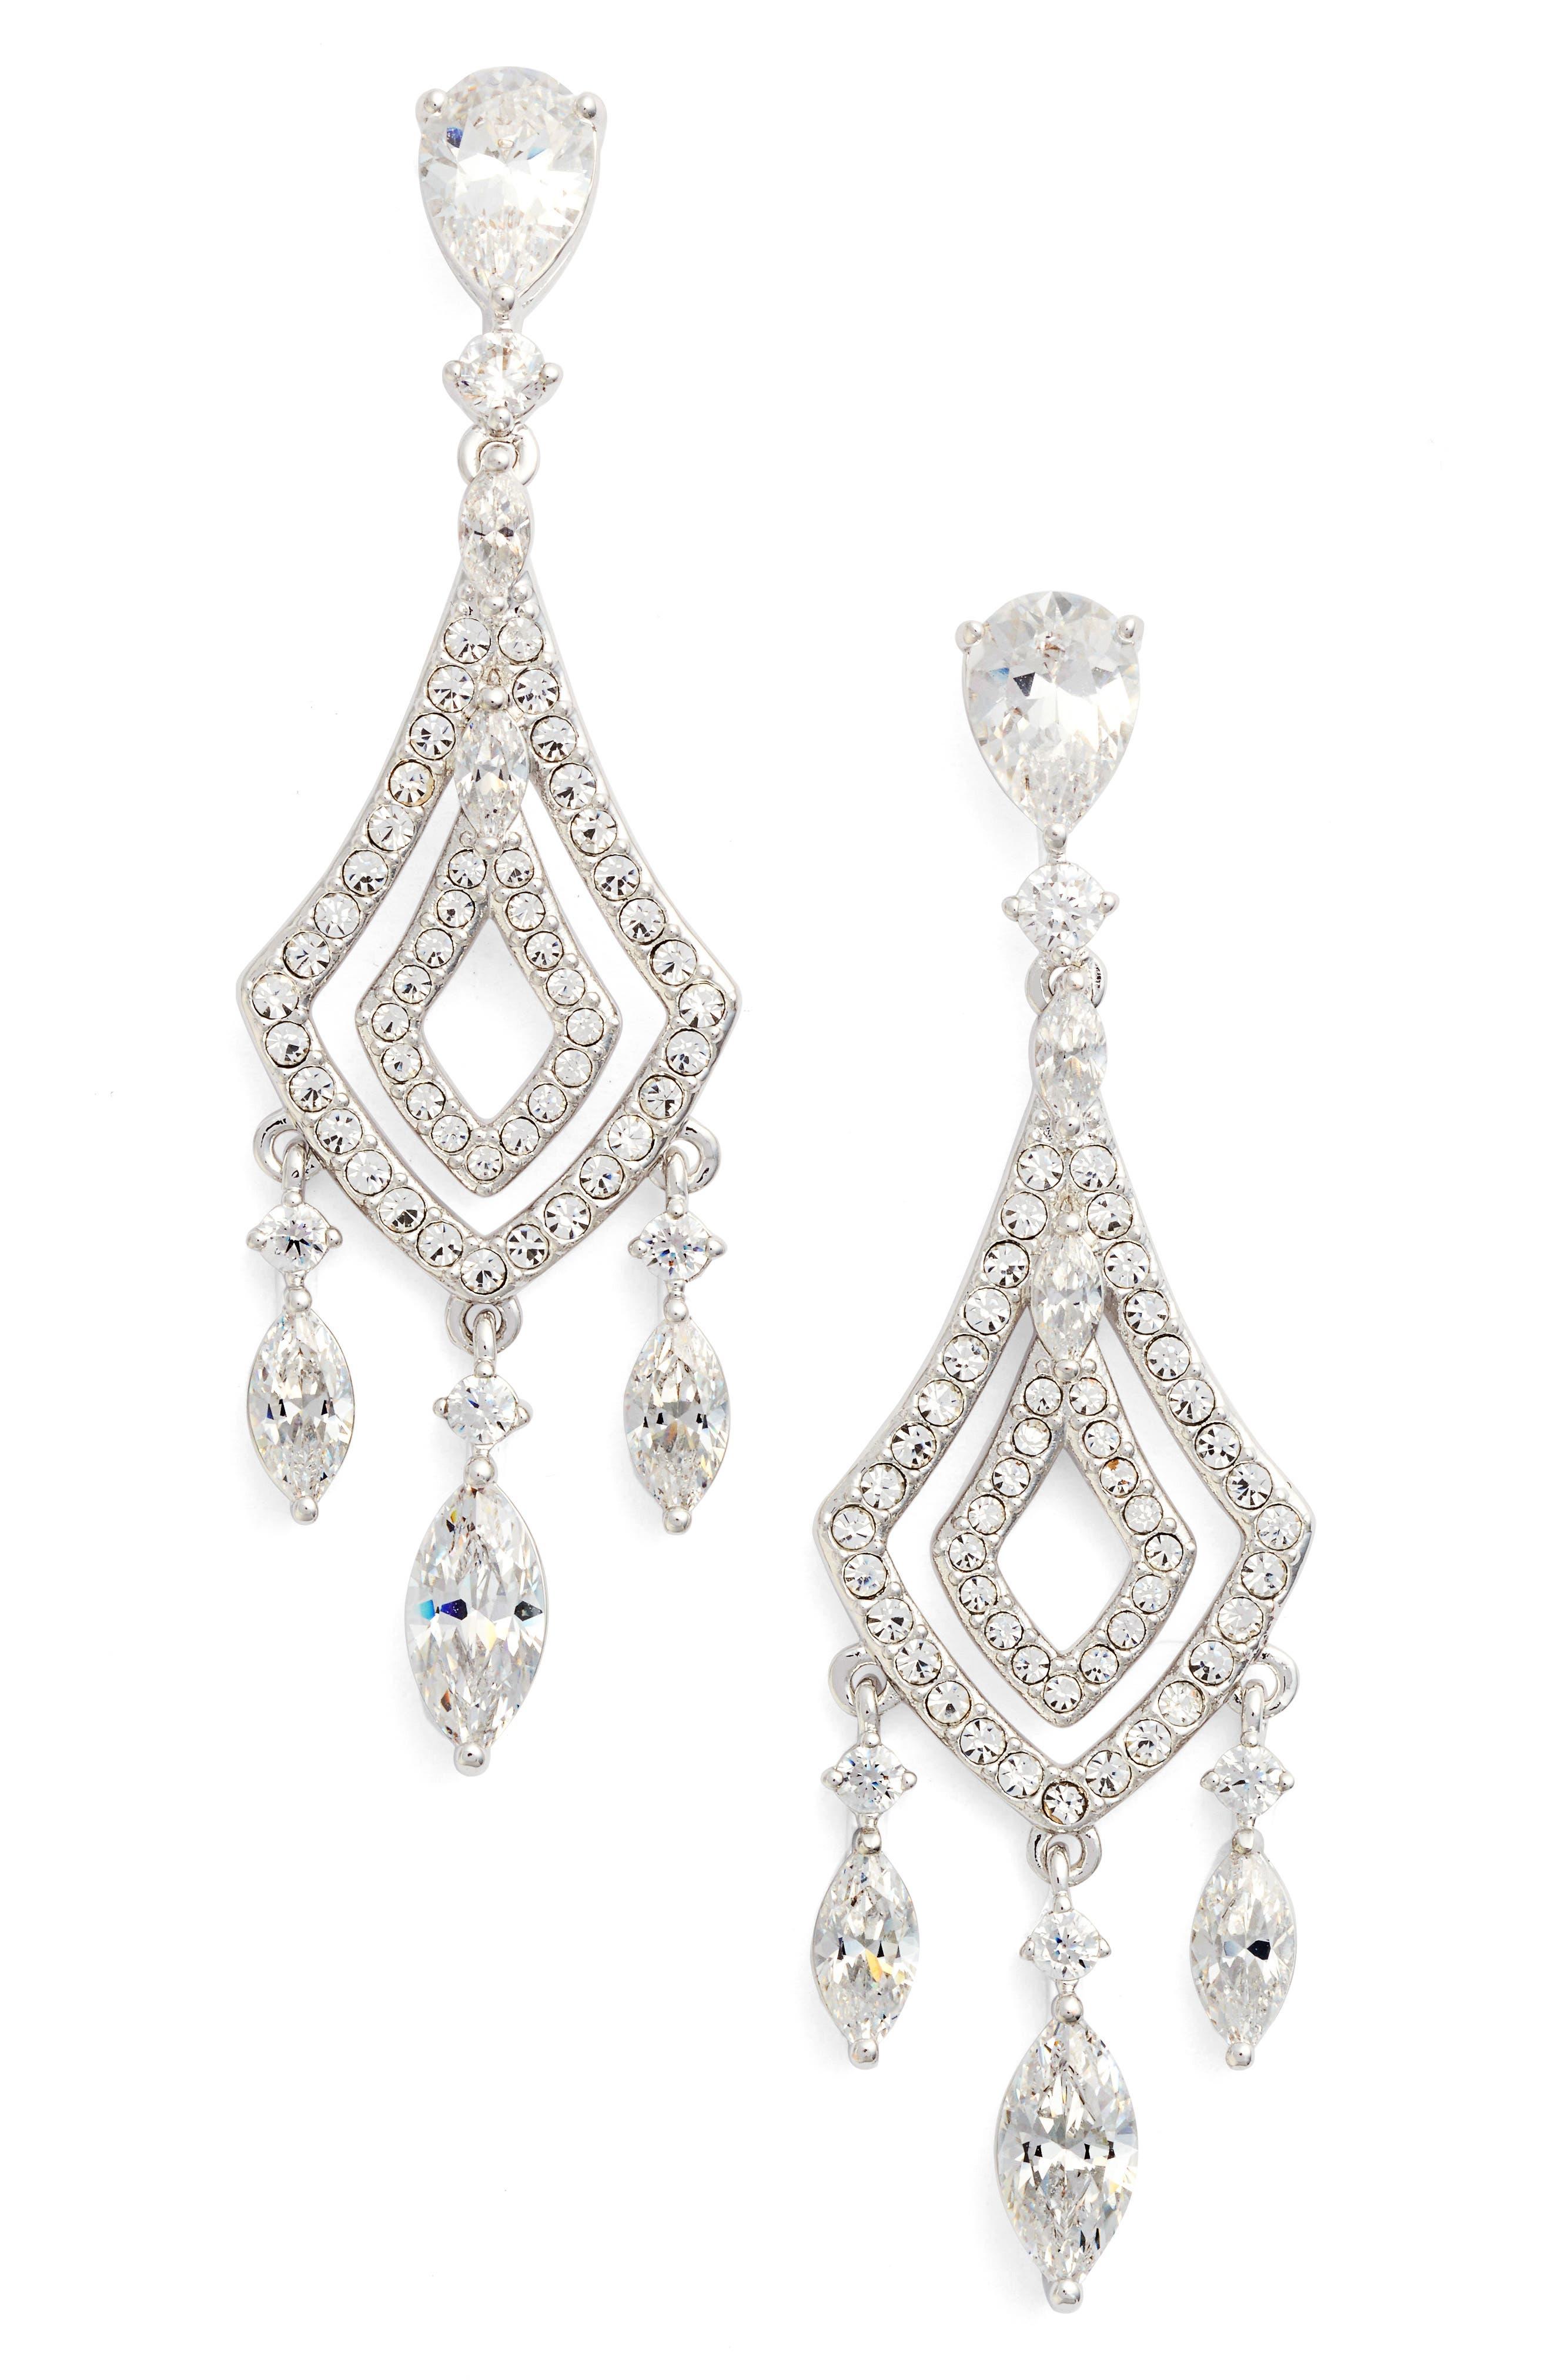 Cubic Zirconia Chandelier Earrings,                         Main,                         color, Silver